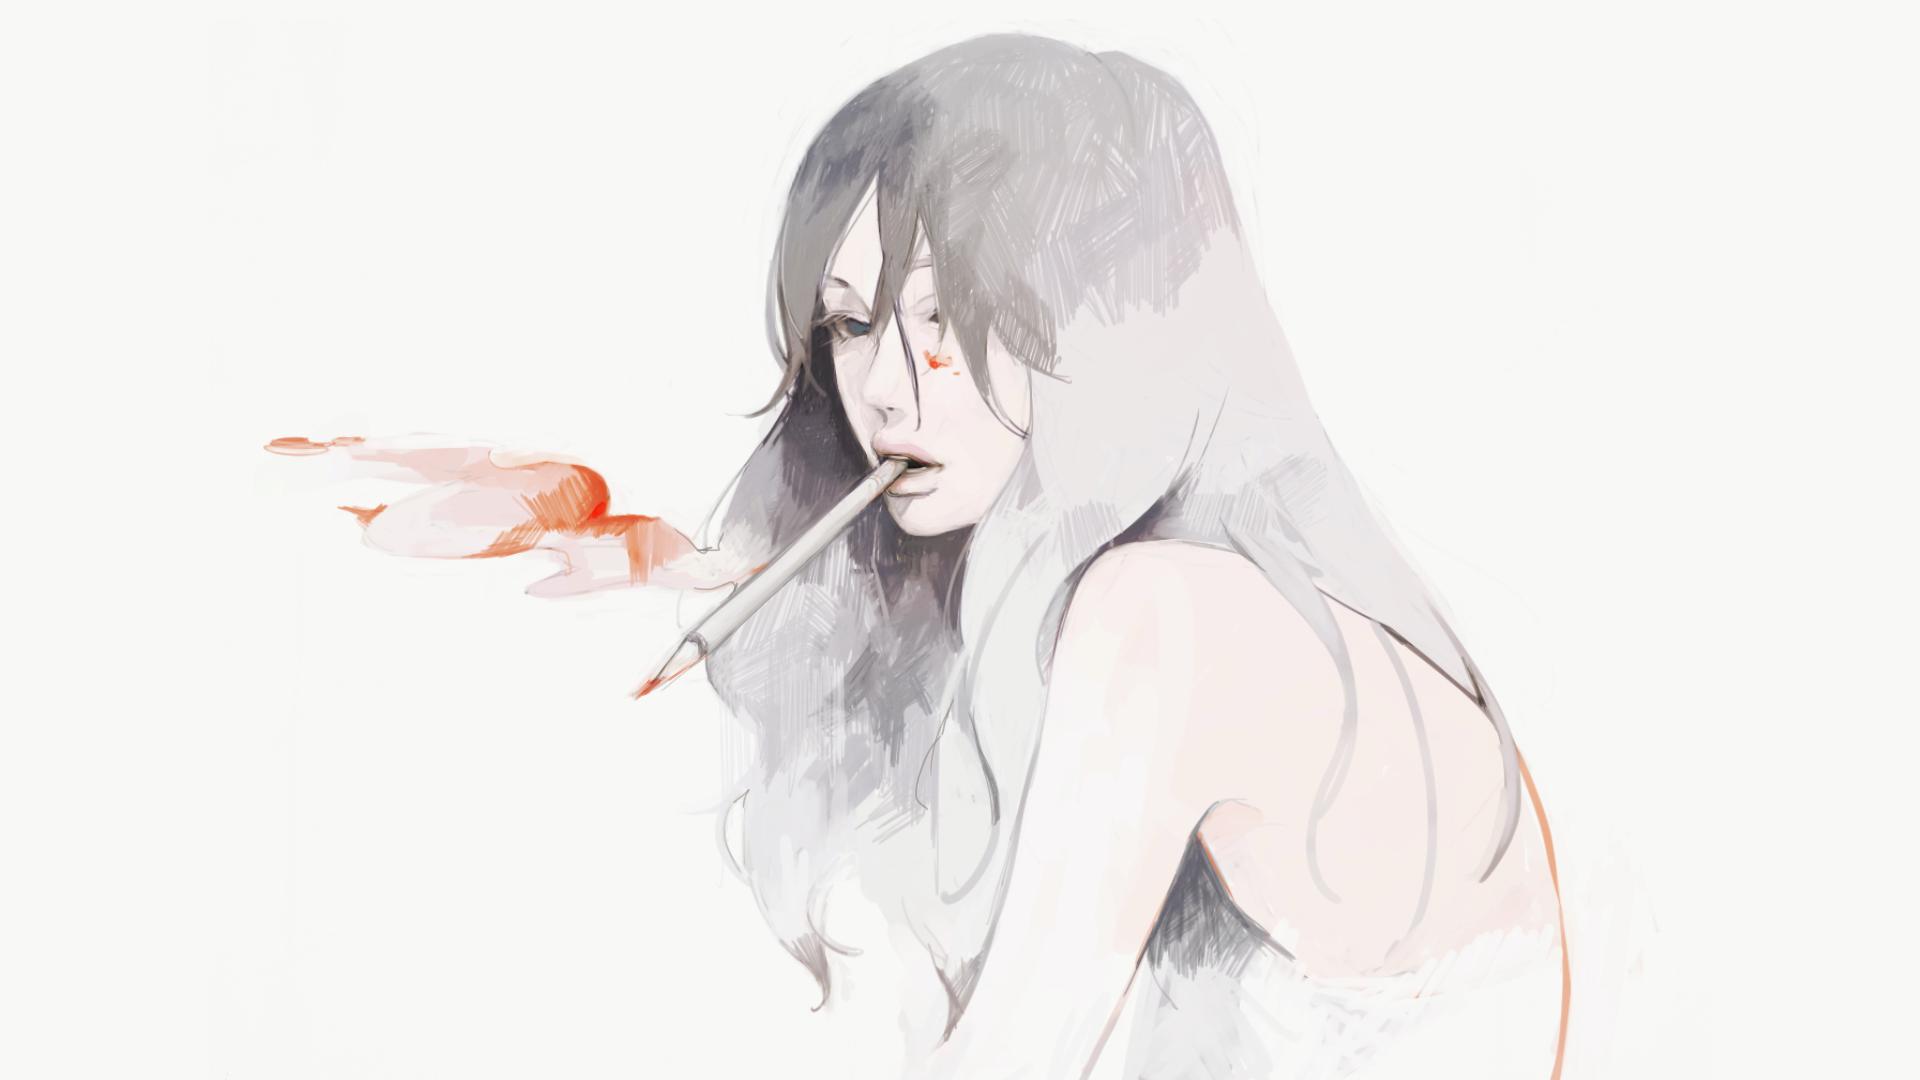 Картинки девушки аниме с сигаретой